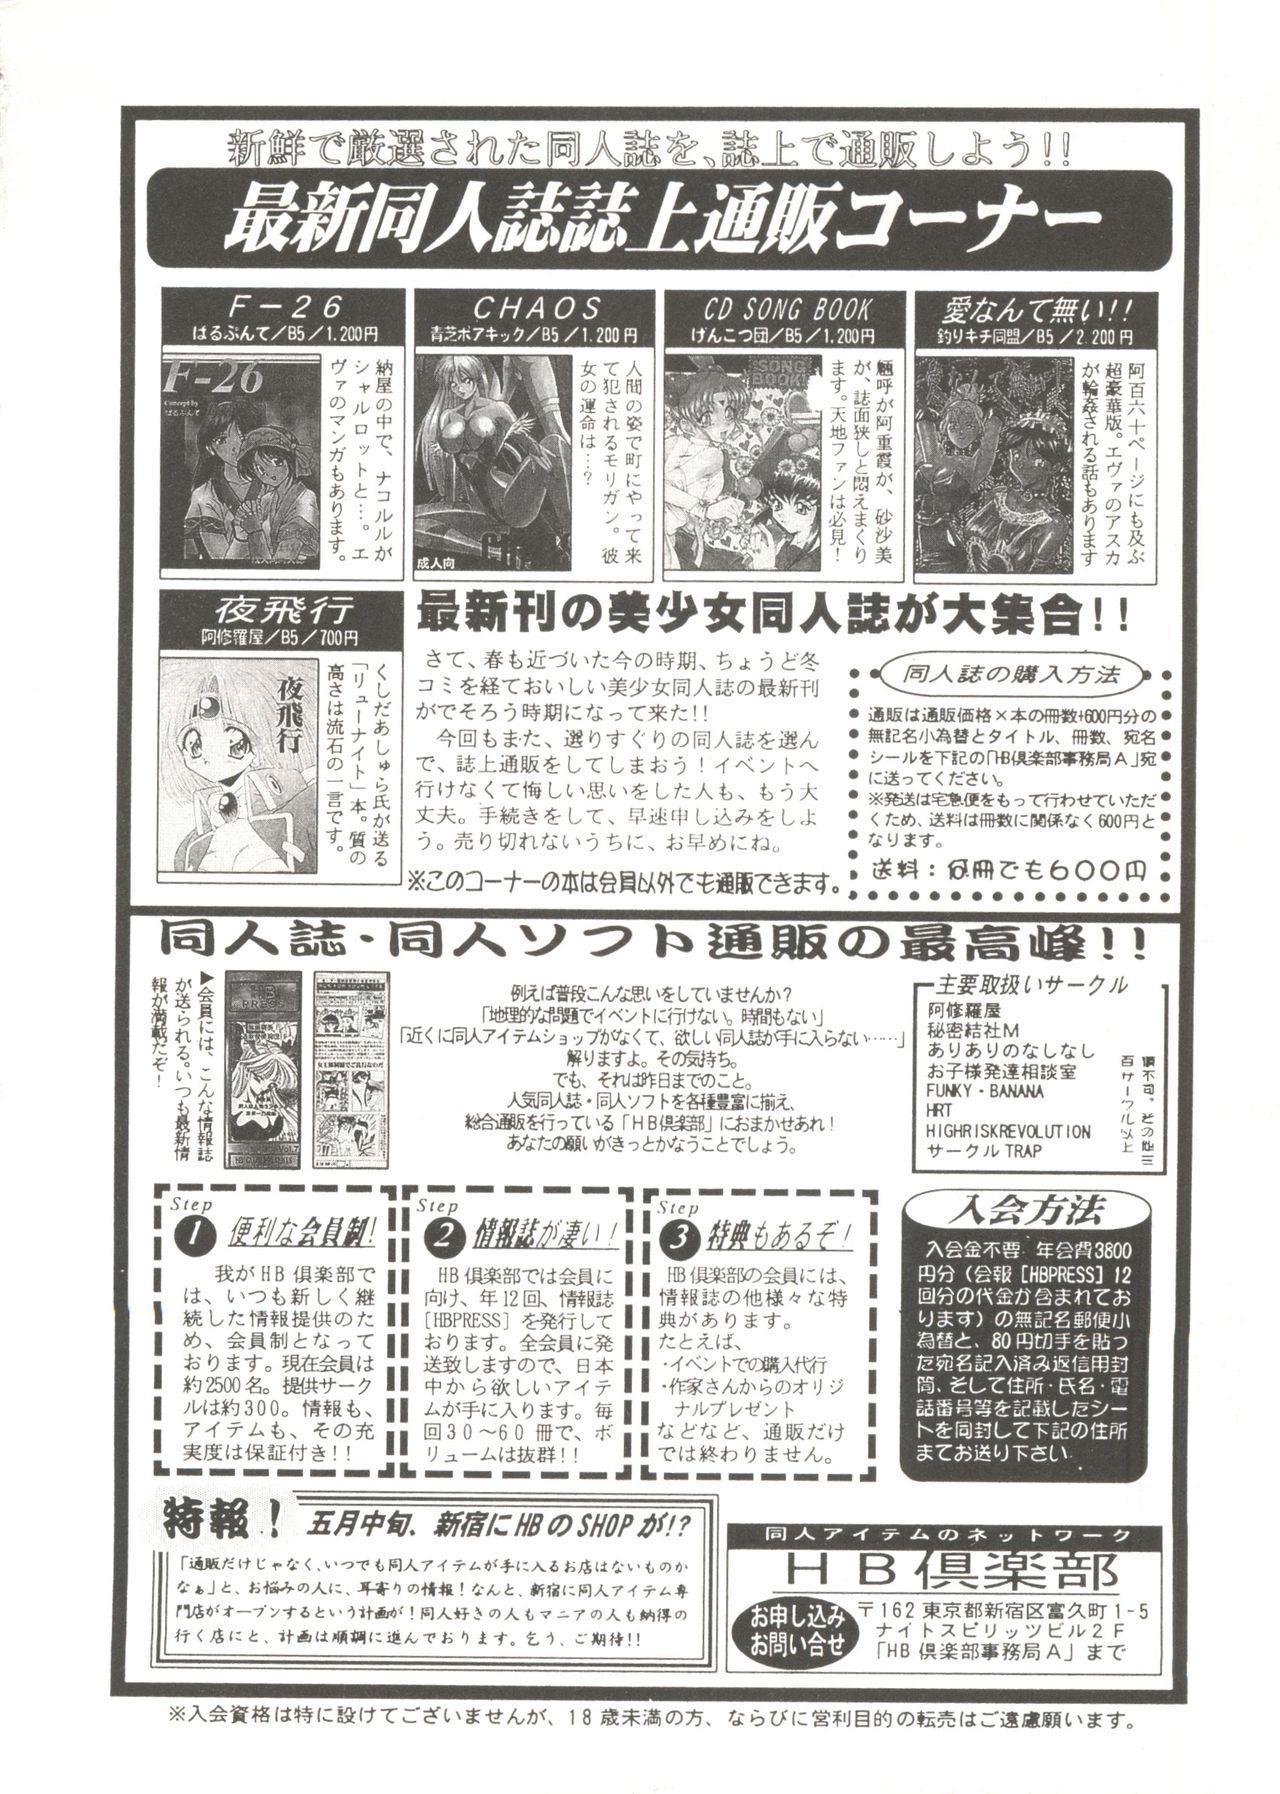 Bishoujo Doujin Peach Club - Pretty Gal's Fanzine Peach Club 9 141